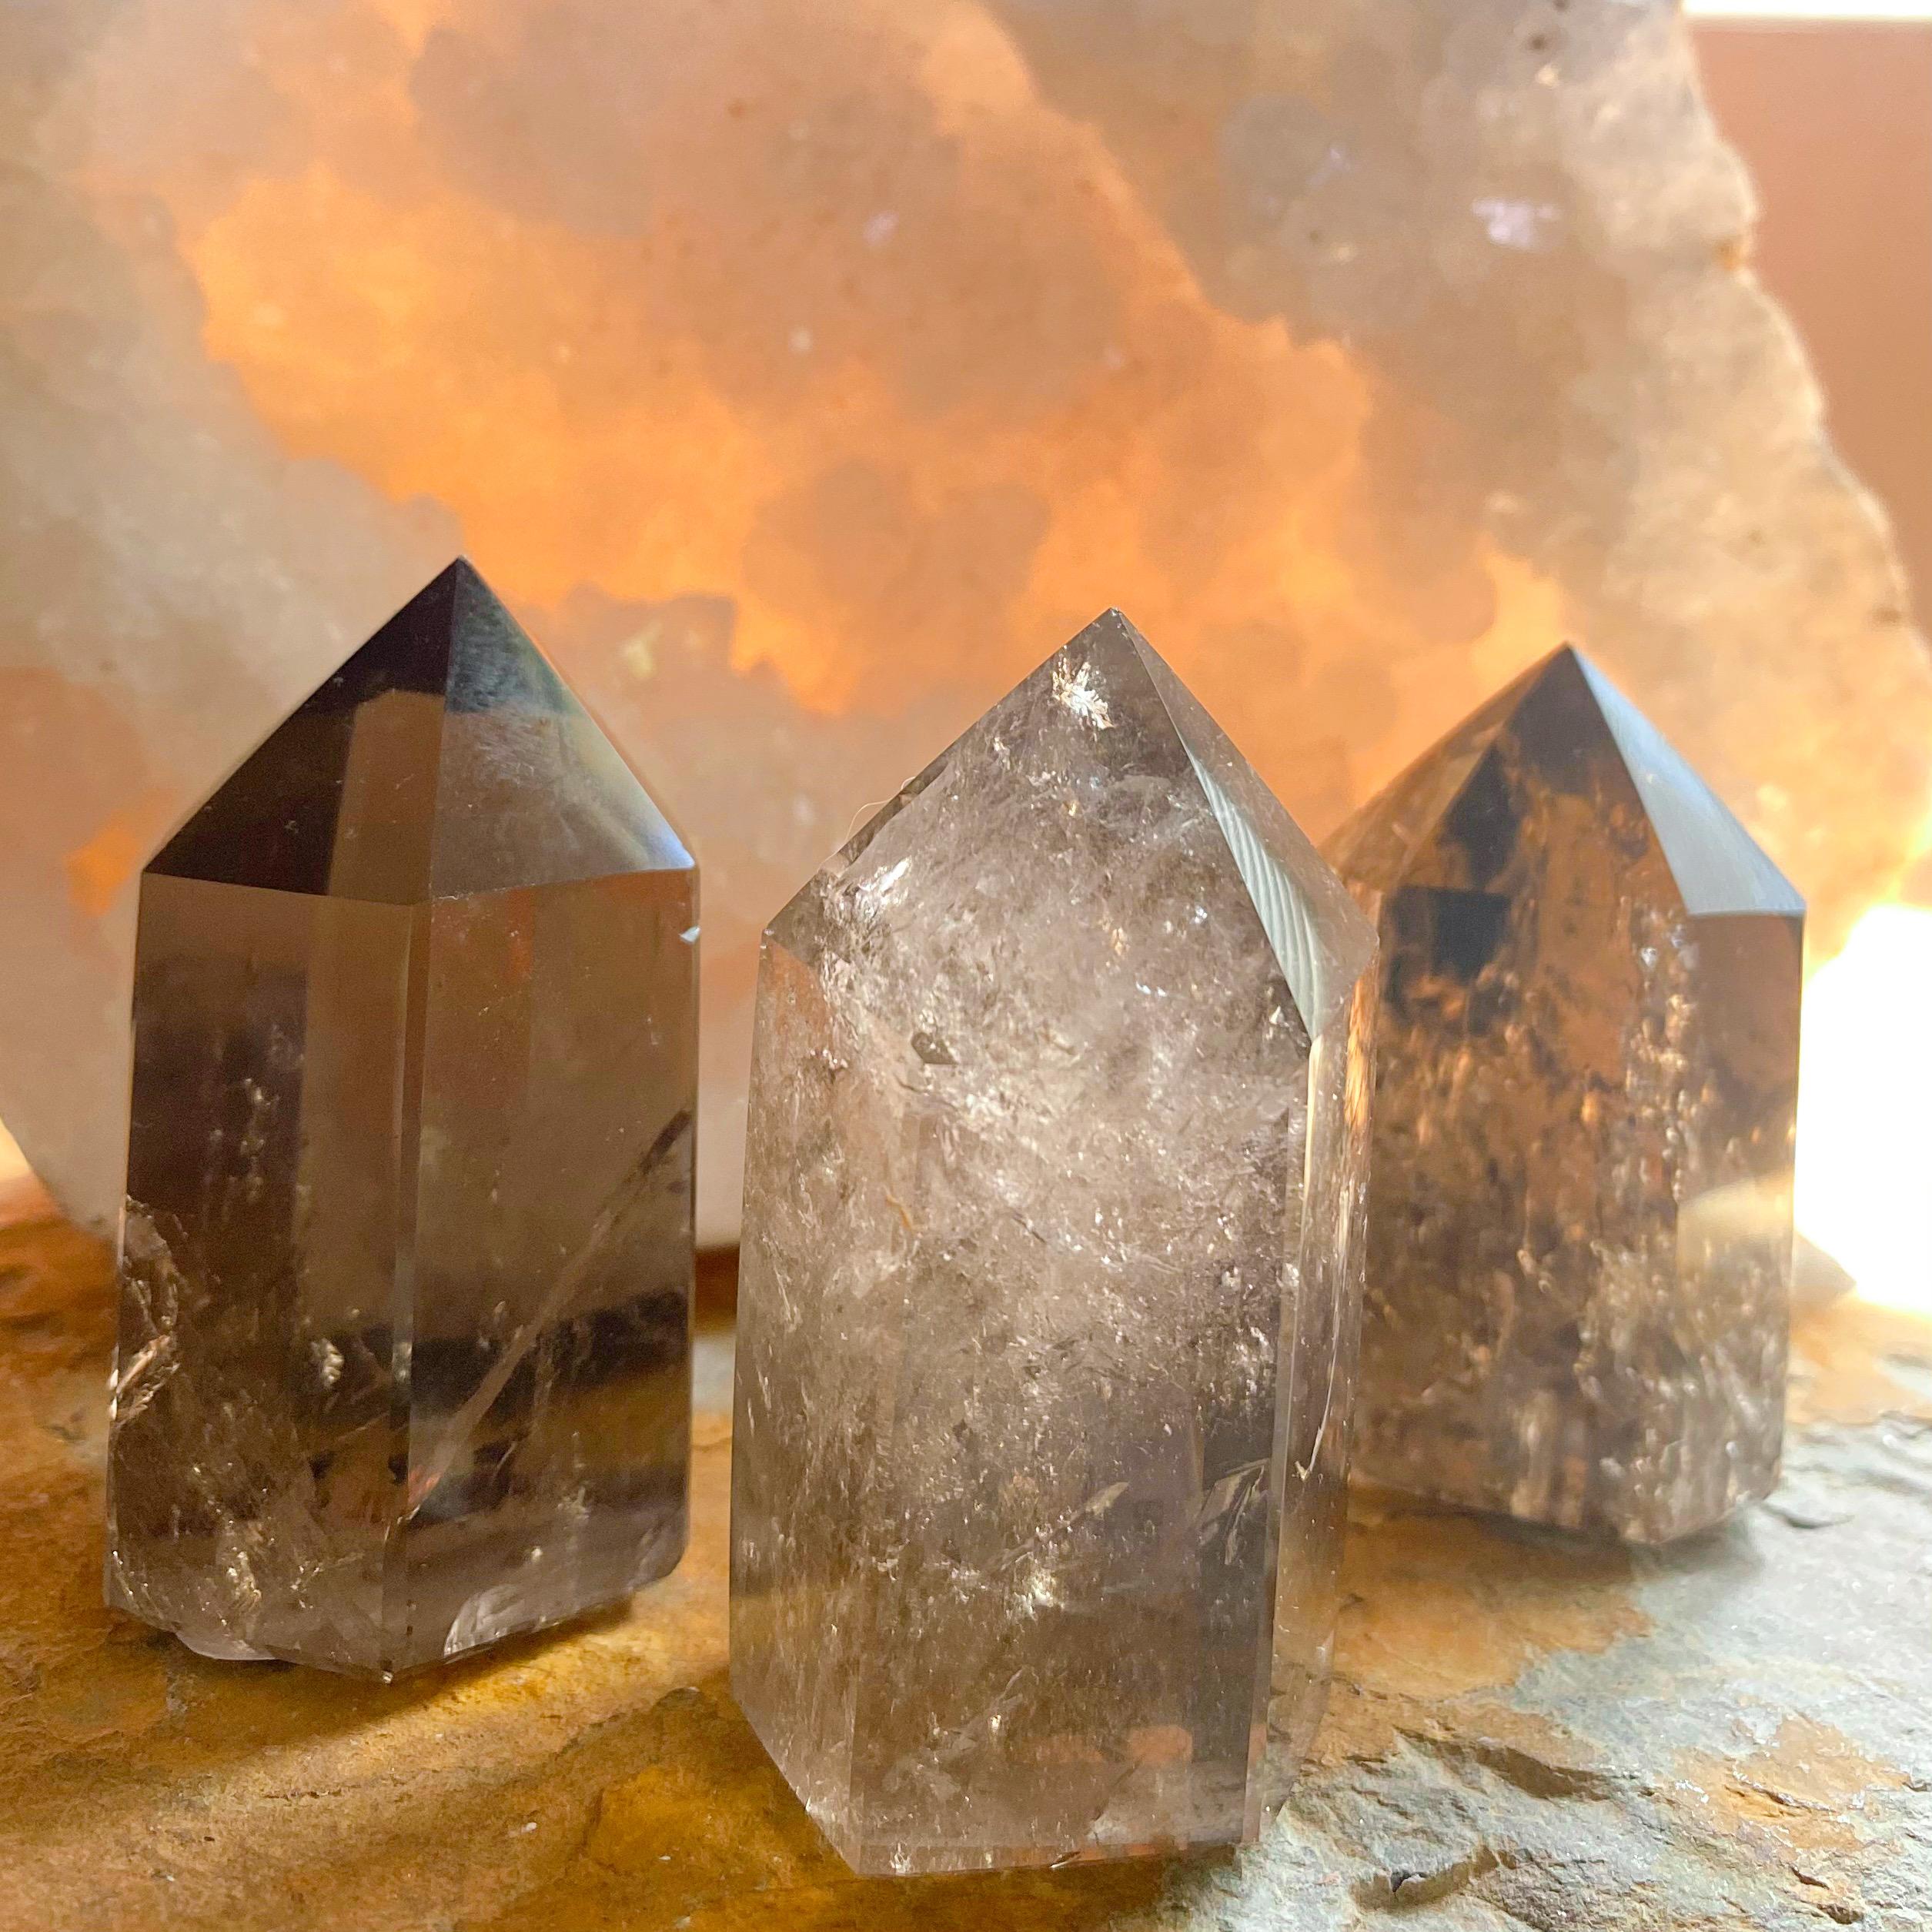 smoky quartz generator crystals absorb negative energy | Paradise Found Santa Barbara